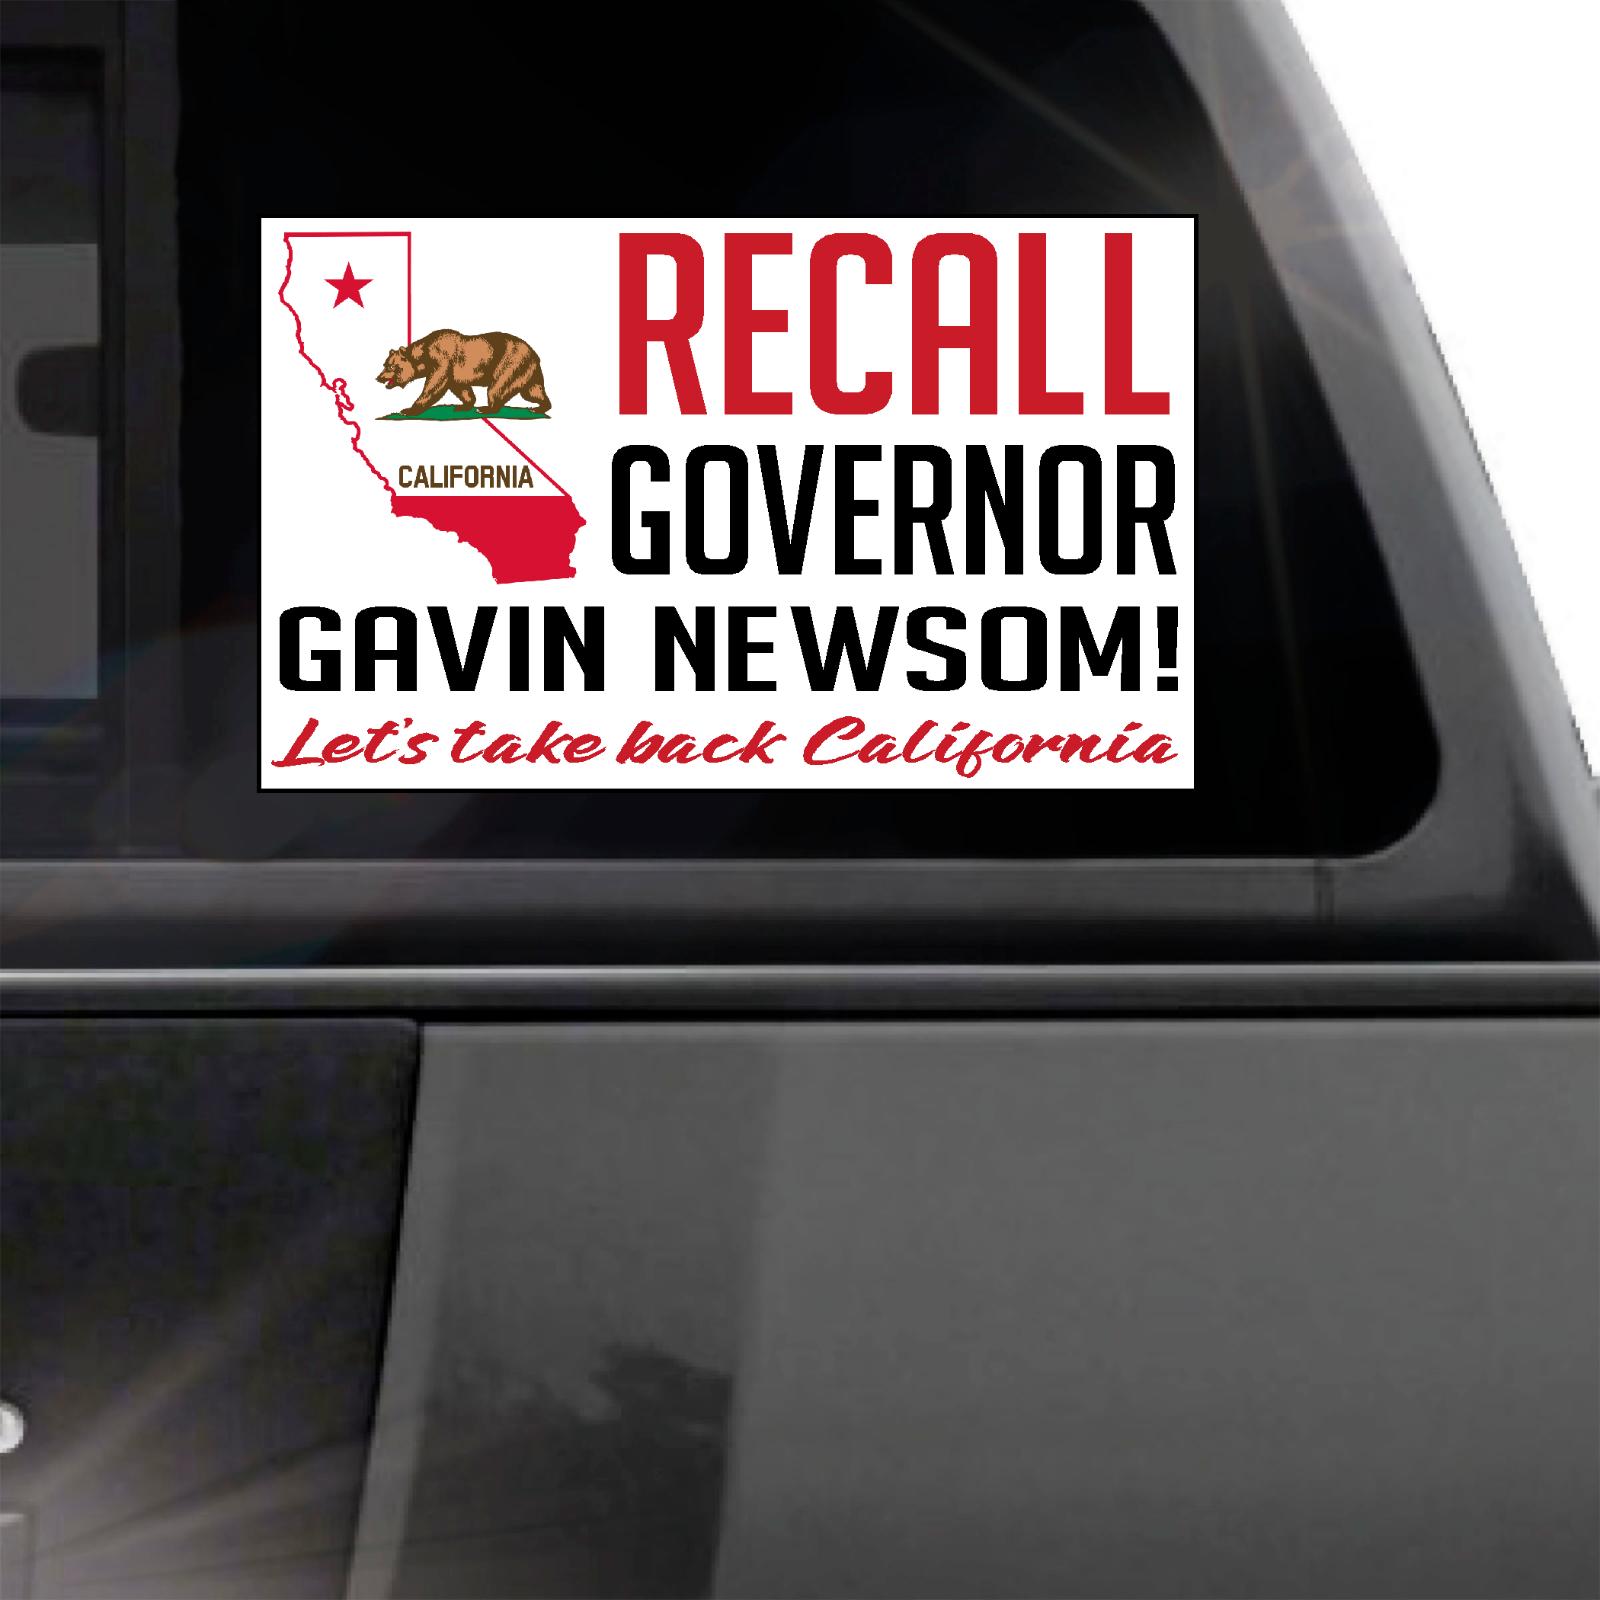 Home Decoration - RECALL California Governor Gavin Newsom window sticker decal  crime tax